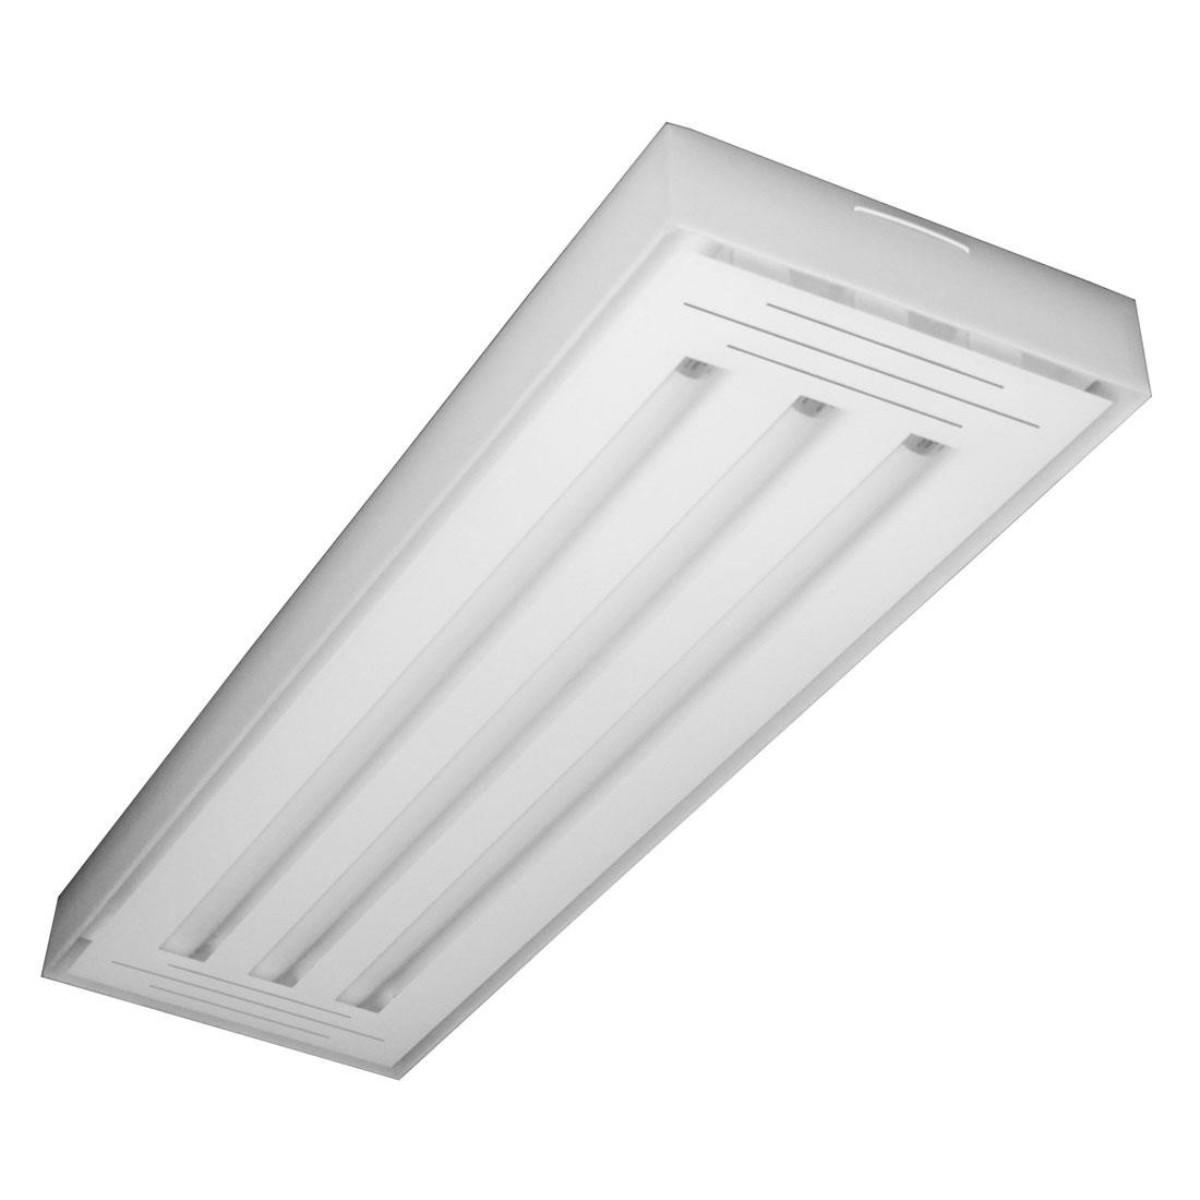 Luminária LED Valencia 3x120 sobrepor branco 6500k Tualux